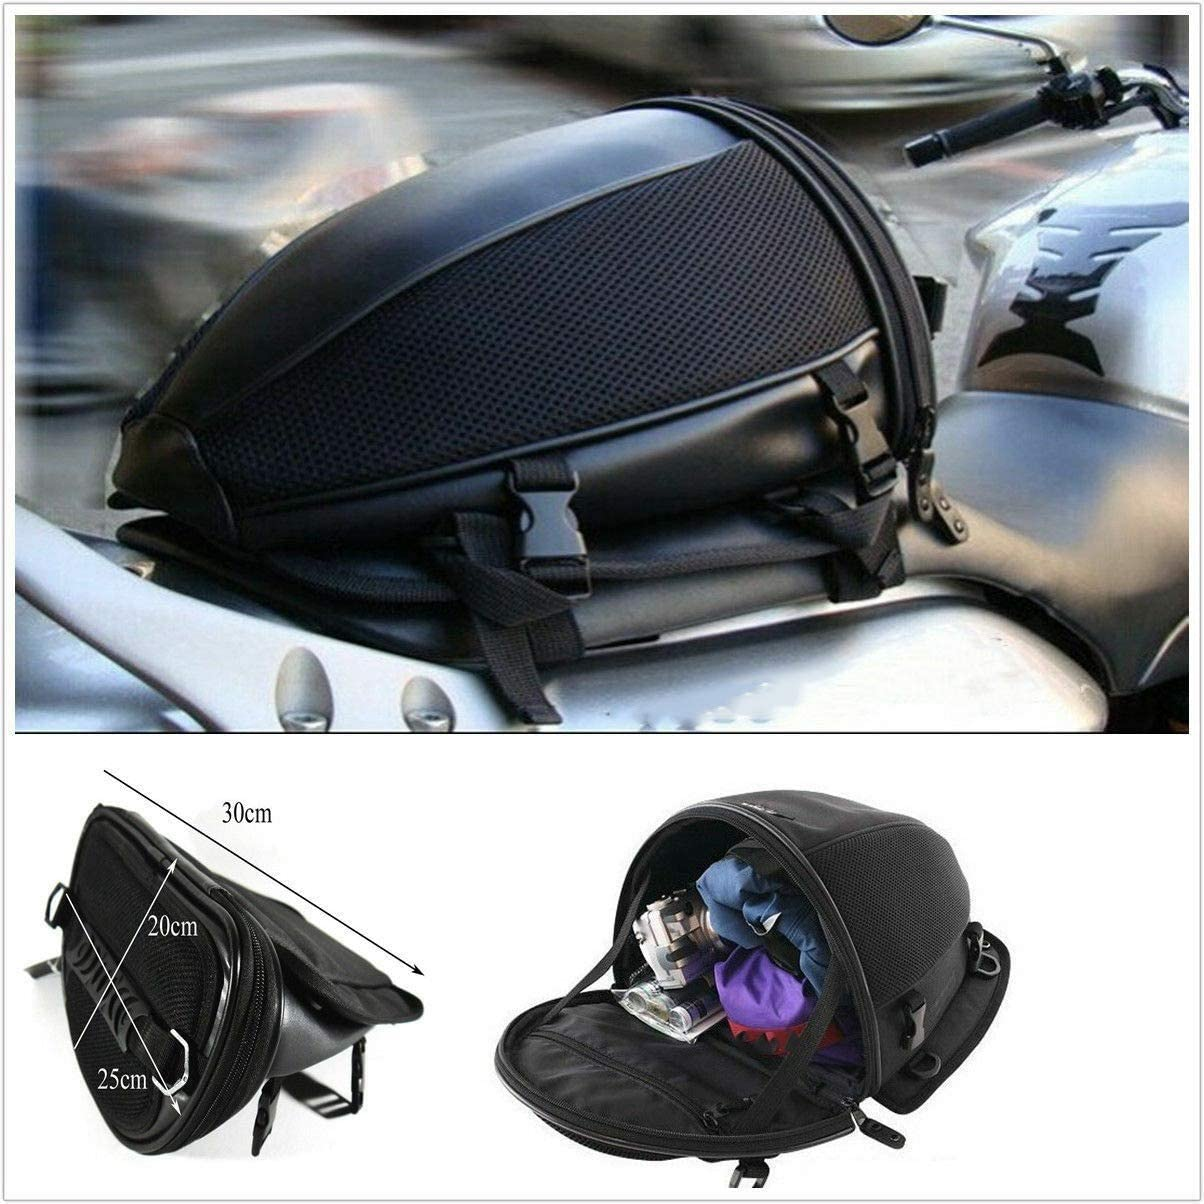 Semoic Portable Dual Sport Bike Waterproof Back Seat Carry Bag Luggage Tail Saddlebag